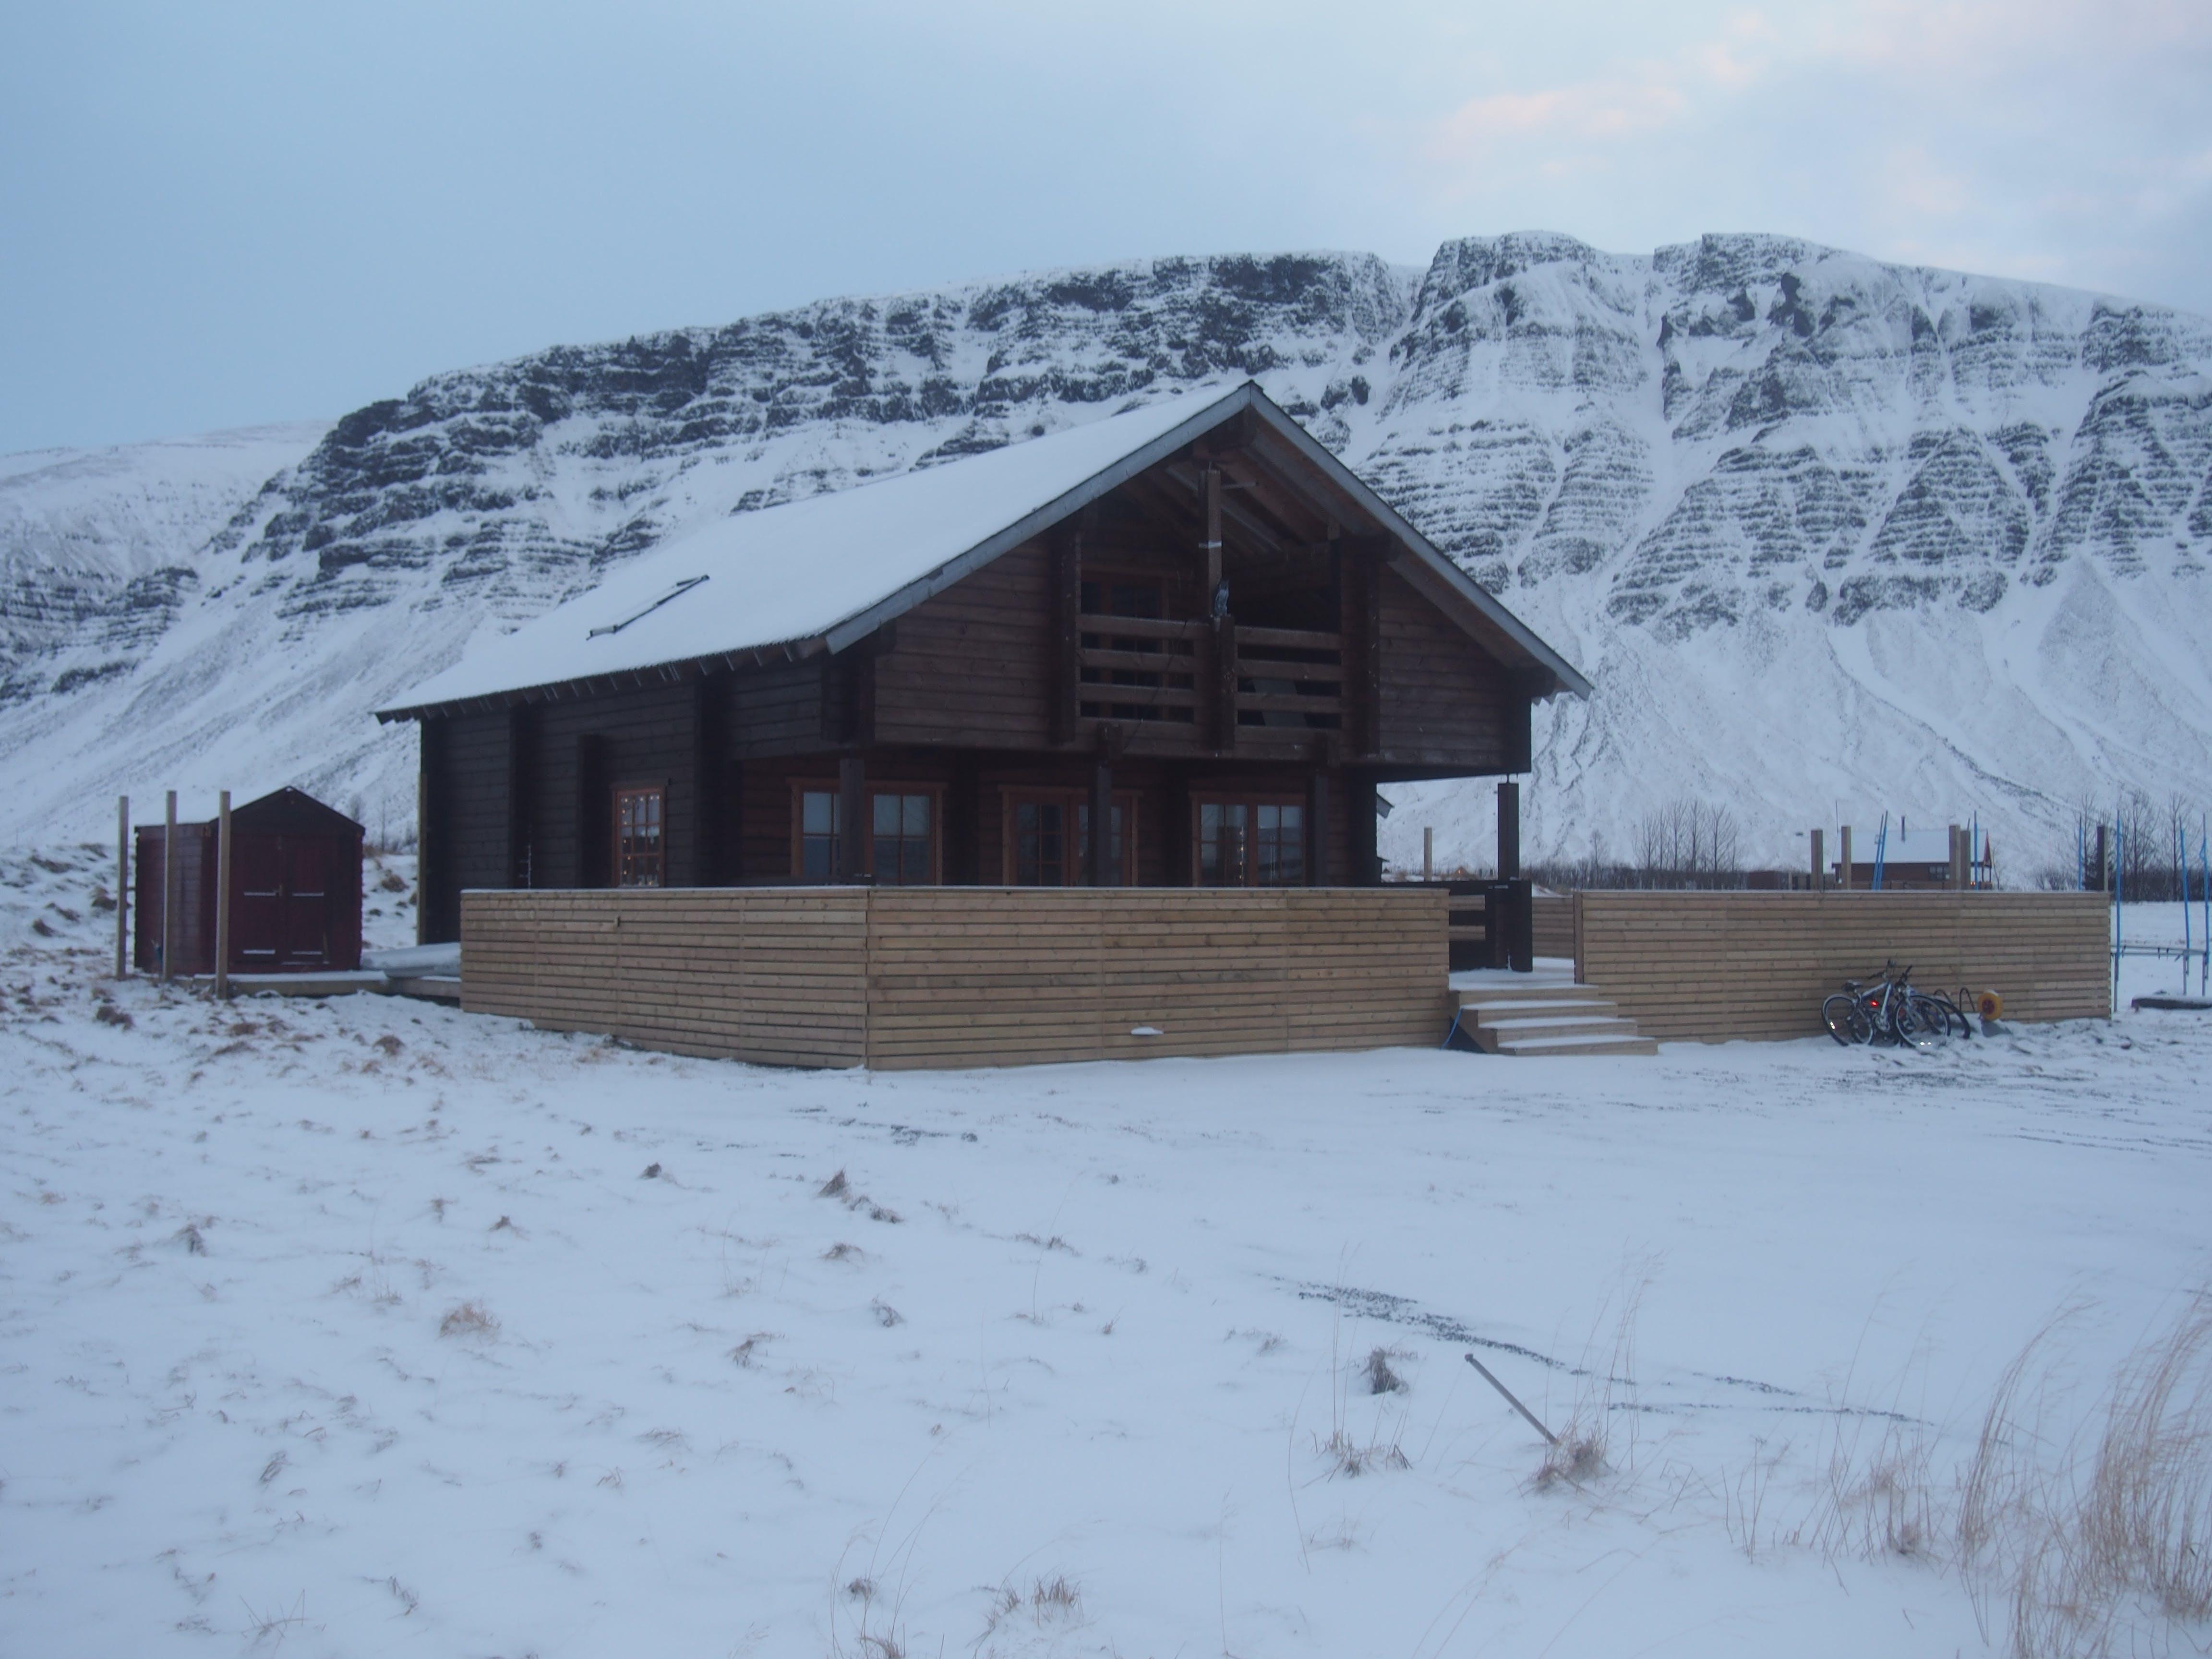 Cottage Villa Lake Meðalsfellsvatn (only 35minute drive from Rey